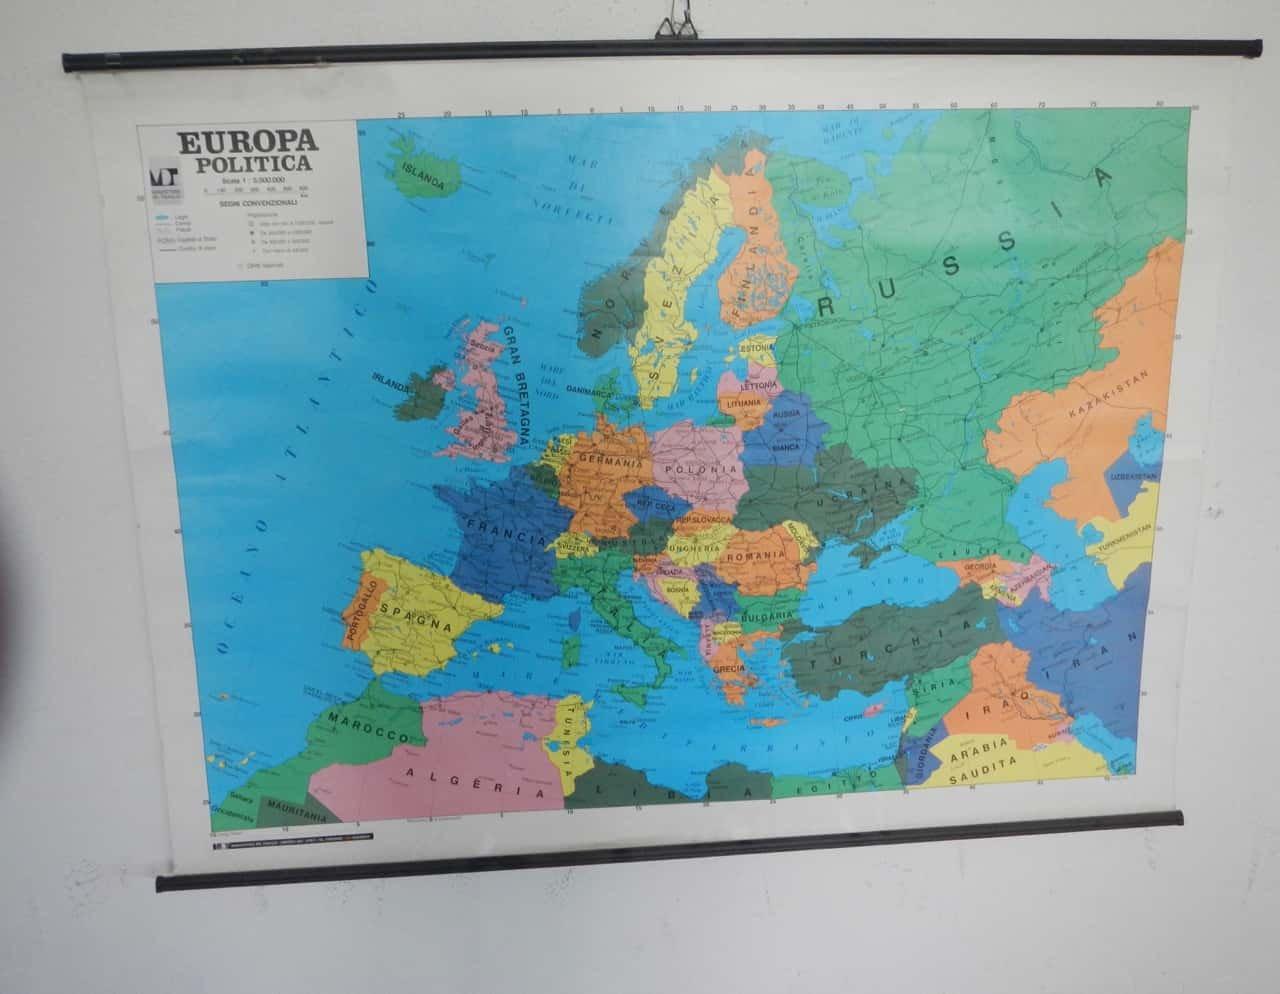 Cartina Geografica Fisica Del Marocco.Political Physical Geographic Map Of Europe From Maniffatura Del Tiguglio 1980s For Sale At Pamono